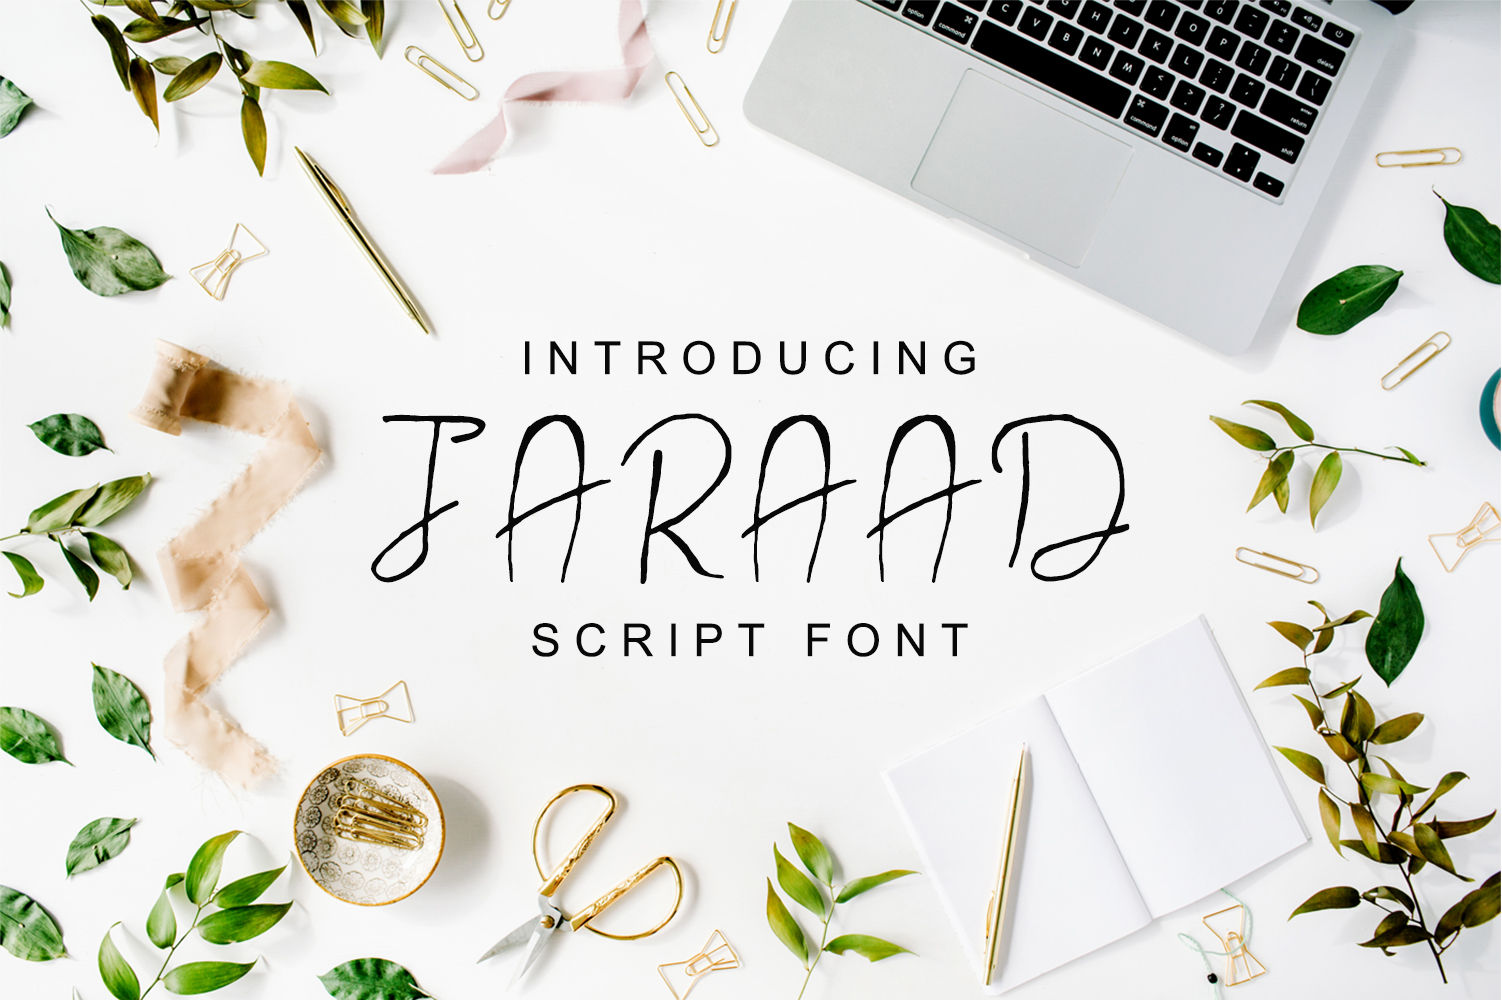 Jaraad Script Typeface example image 1